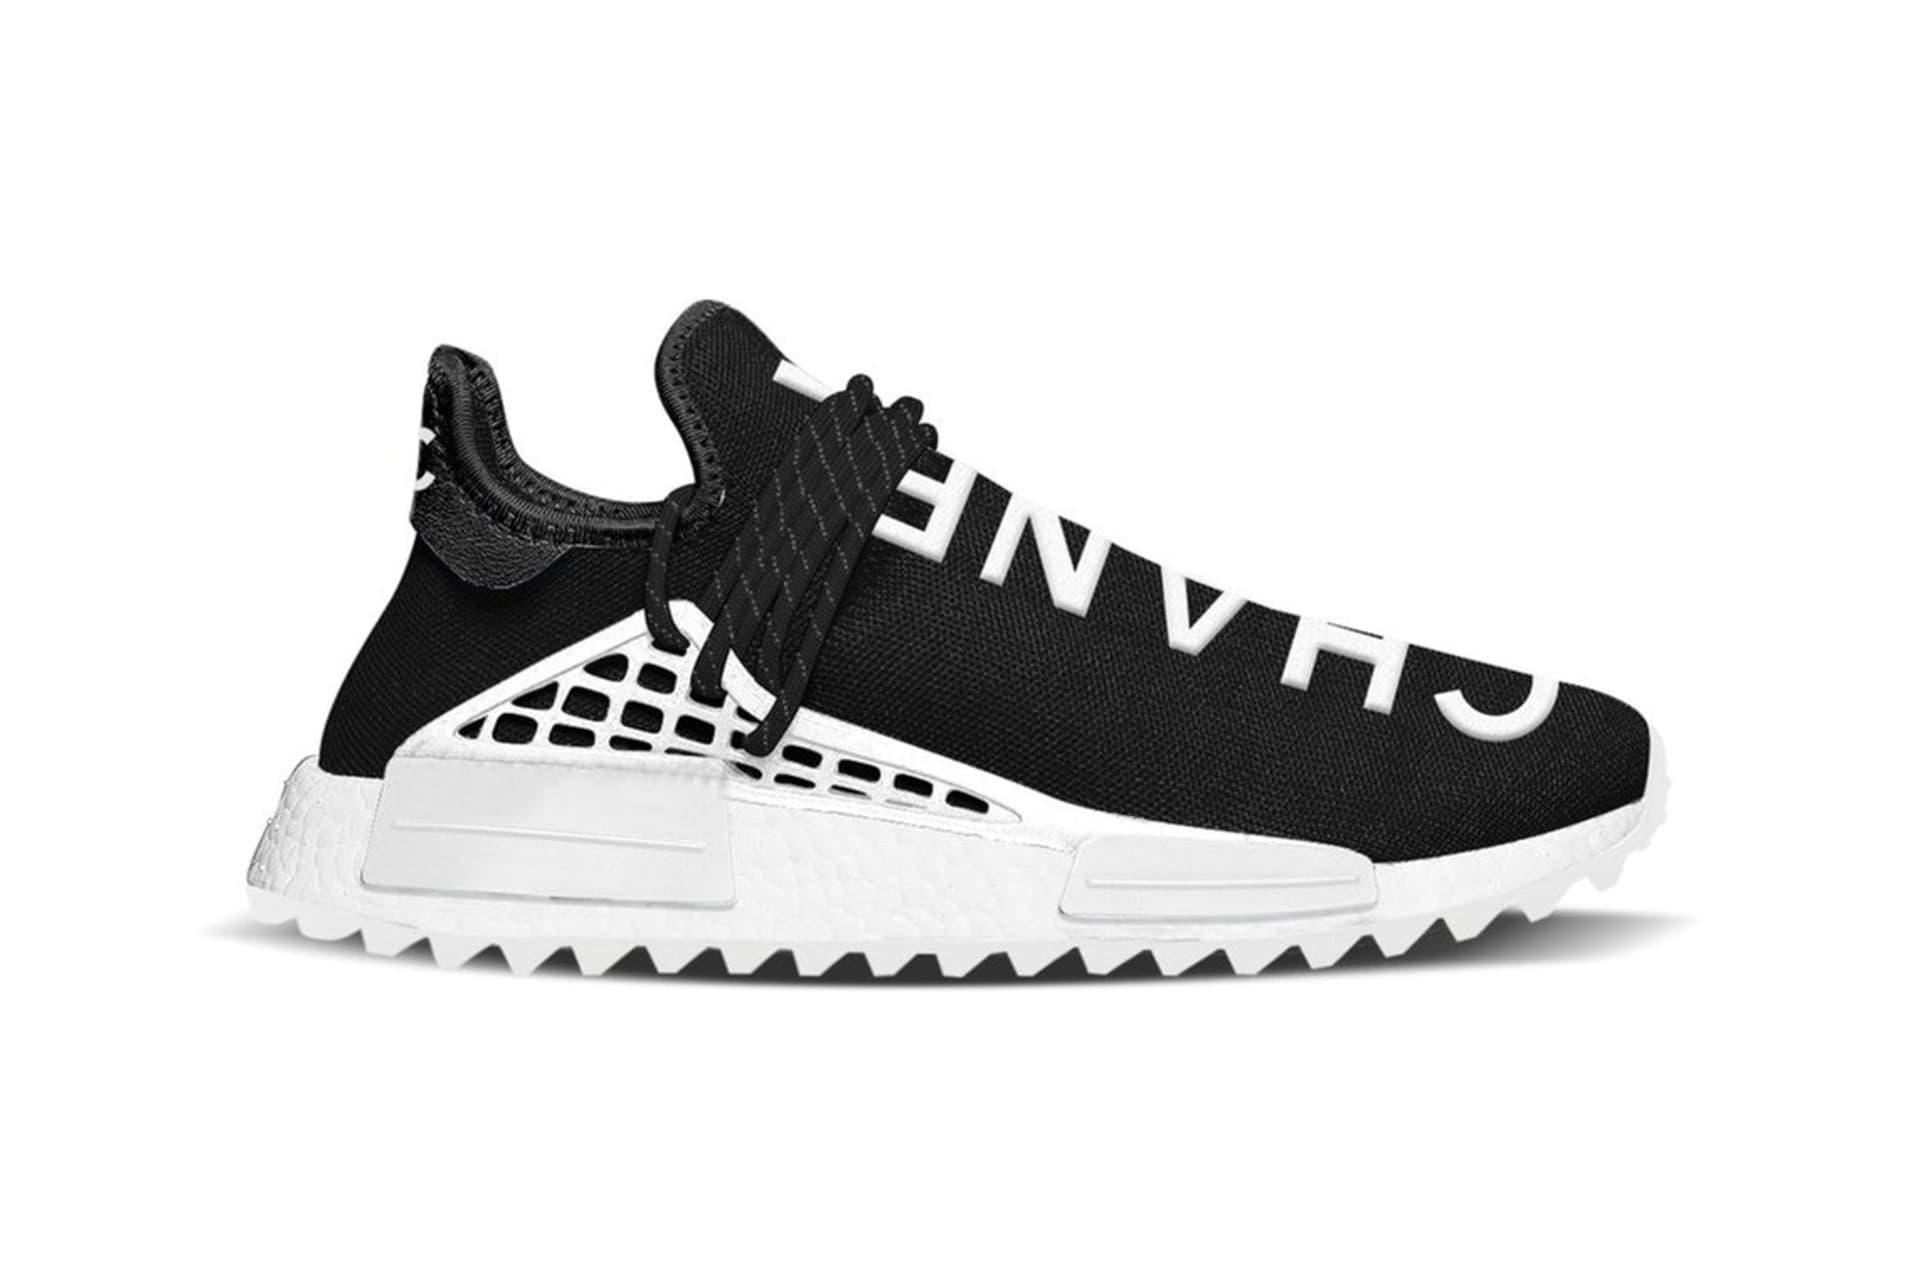 68c8ec28d14112 2. Chanel x Adidas Pharrell NMD Hu Race Trail